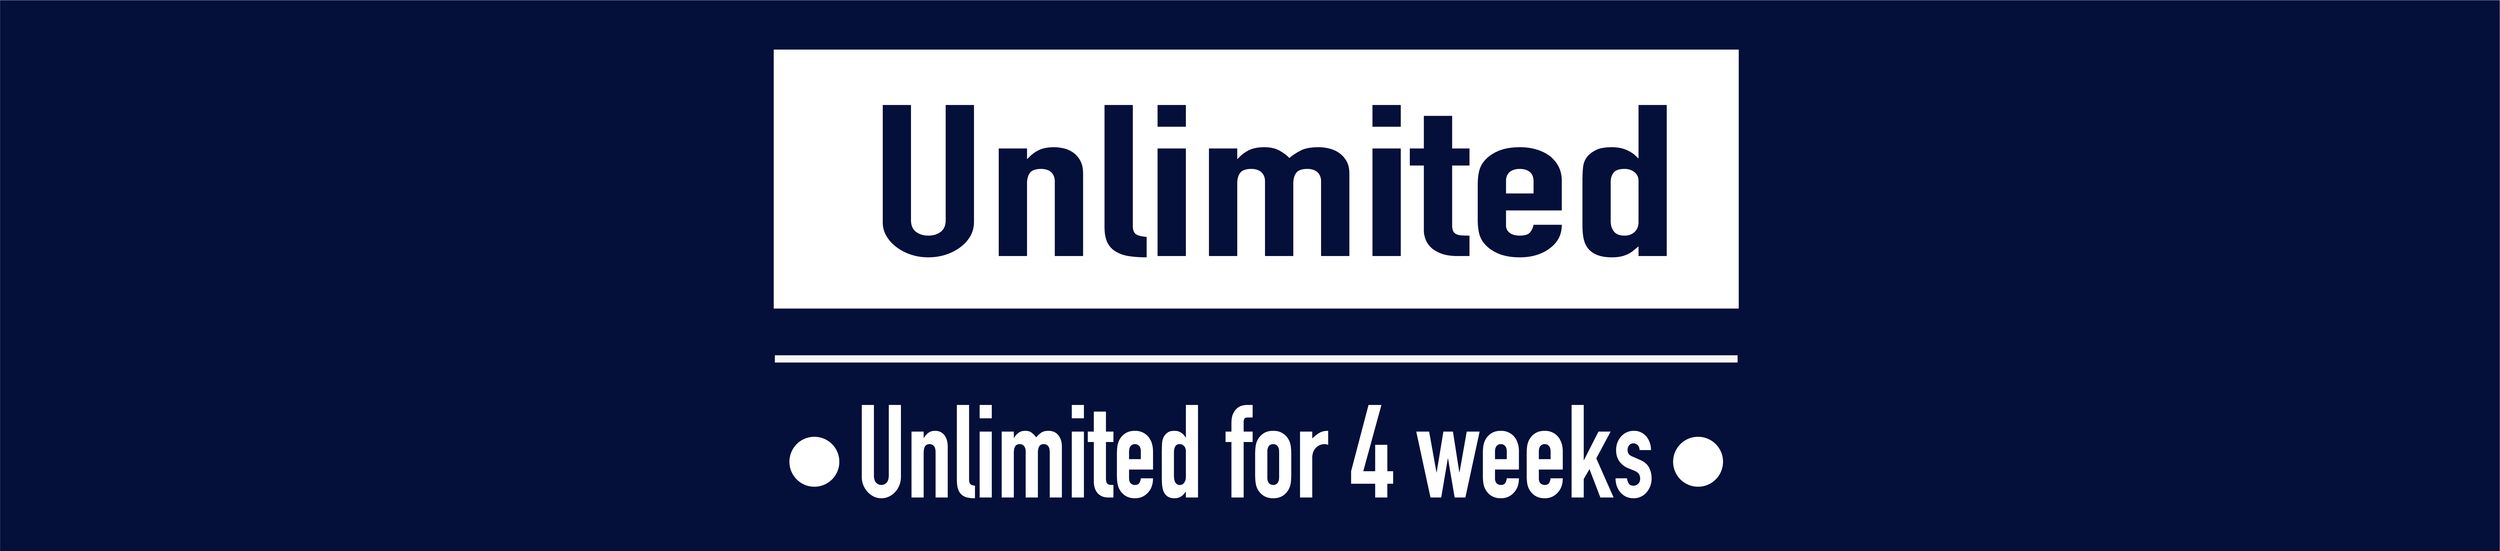 Unlimitedheader1-02.png